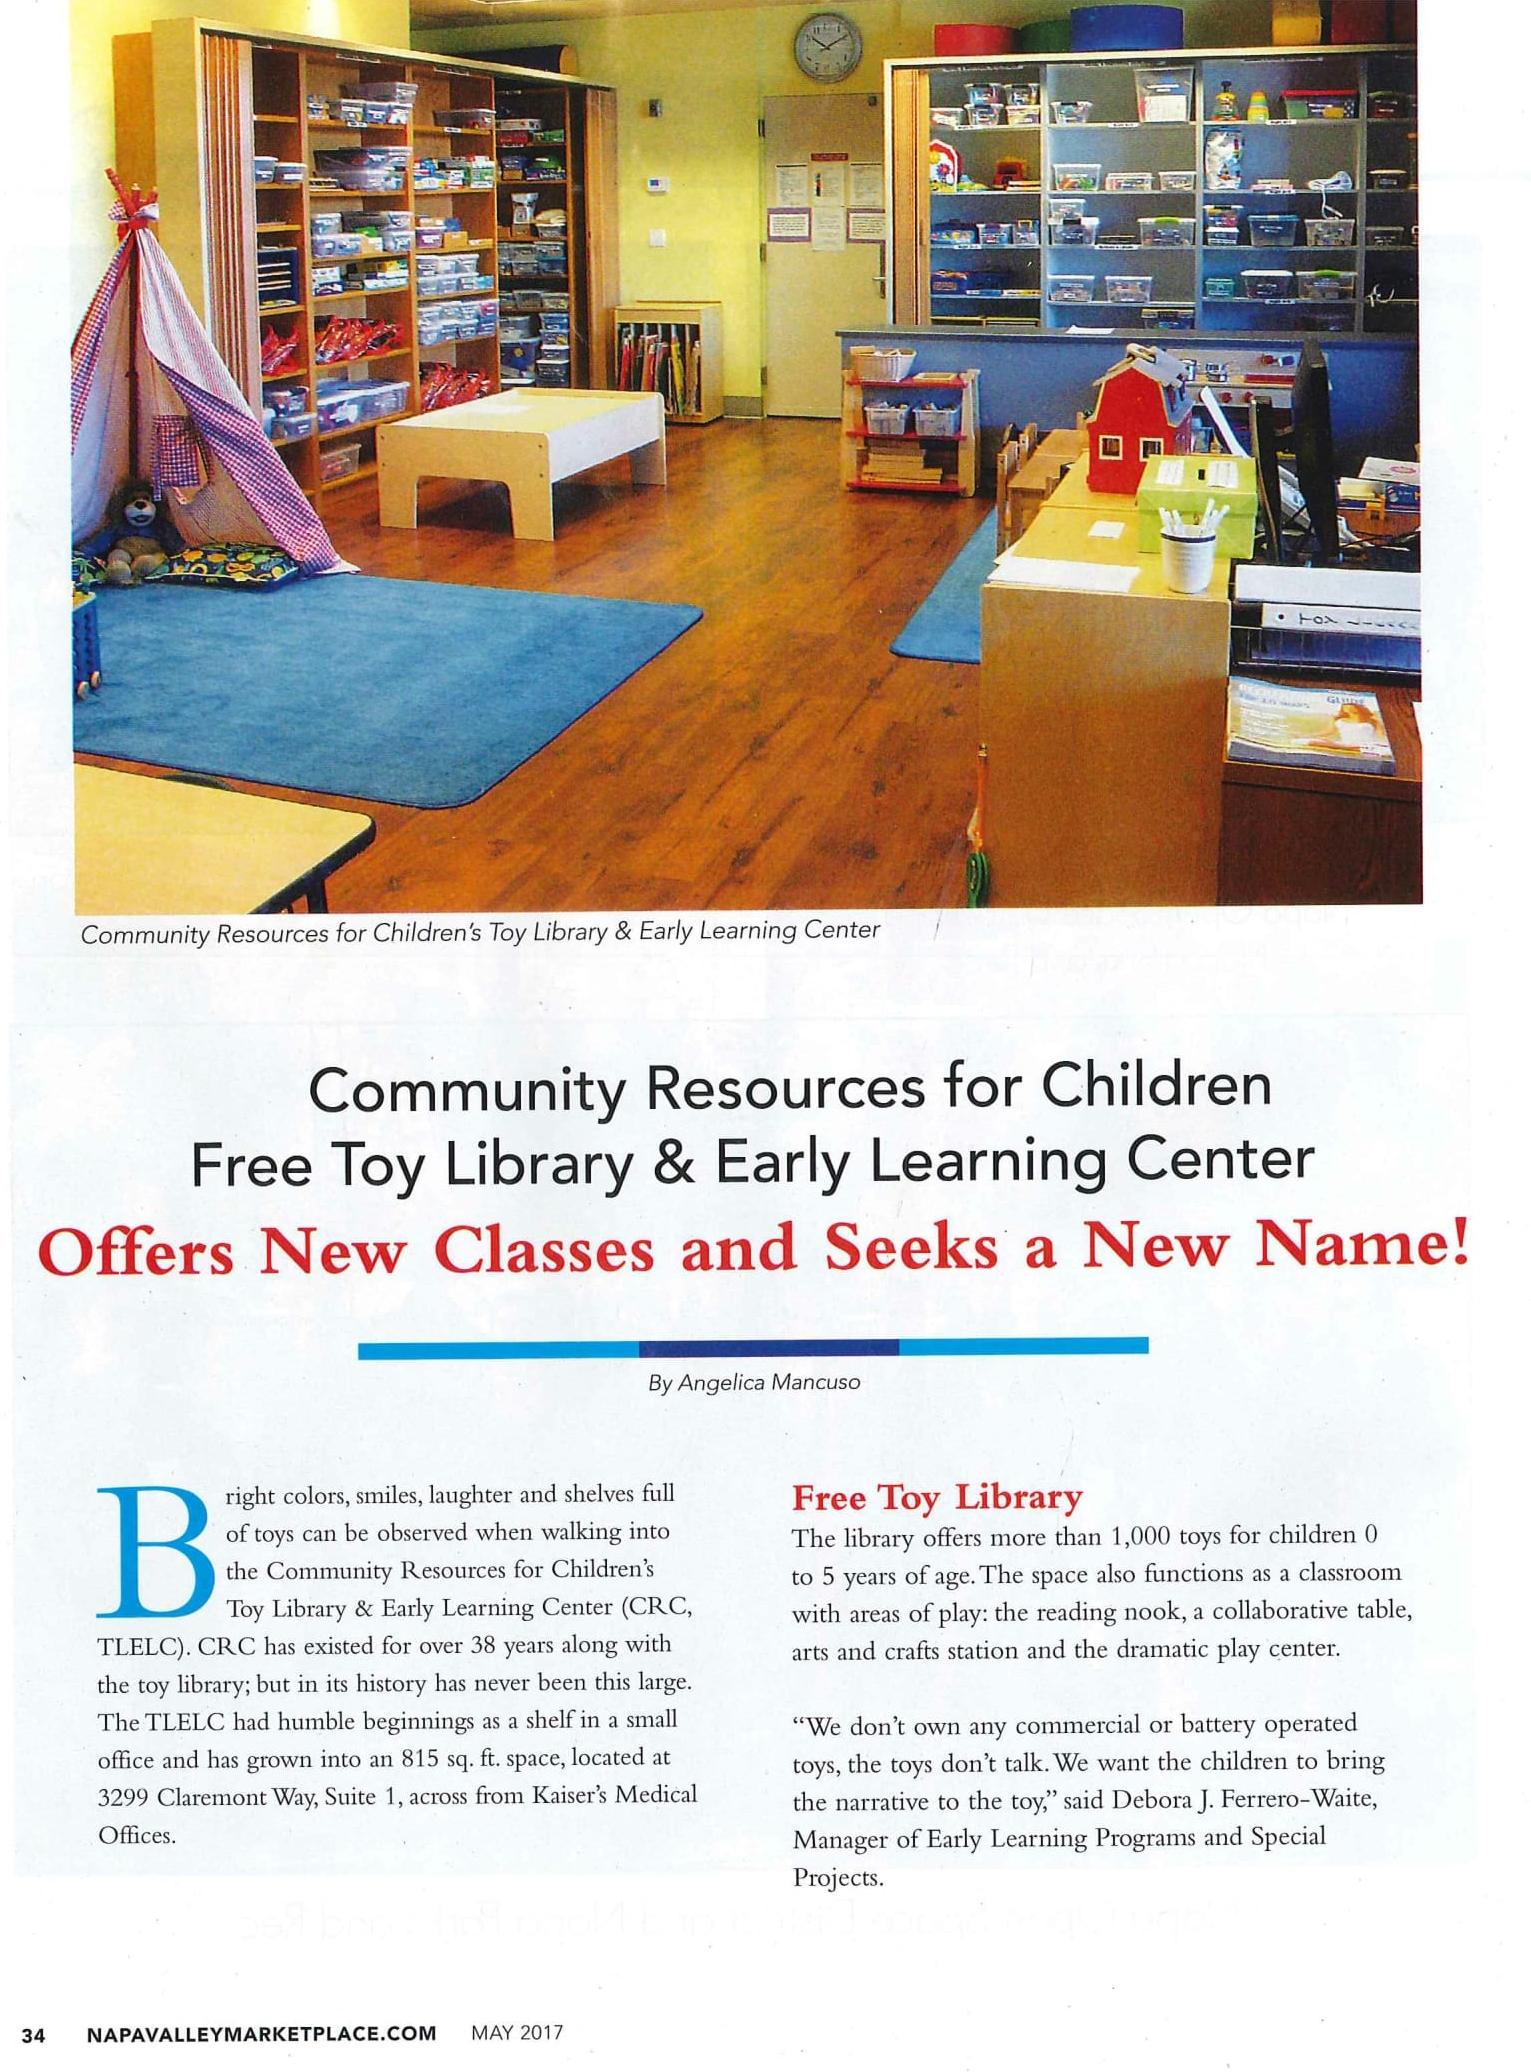 CRC in Marketplace Magazine